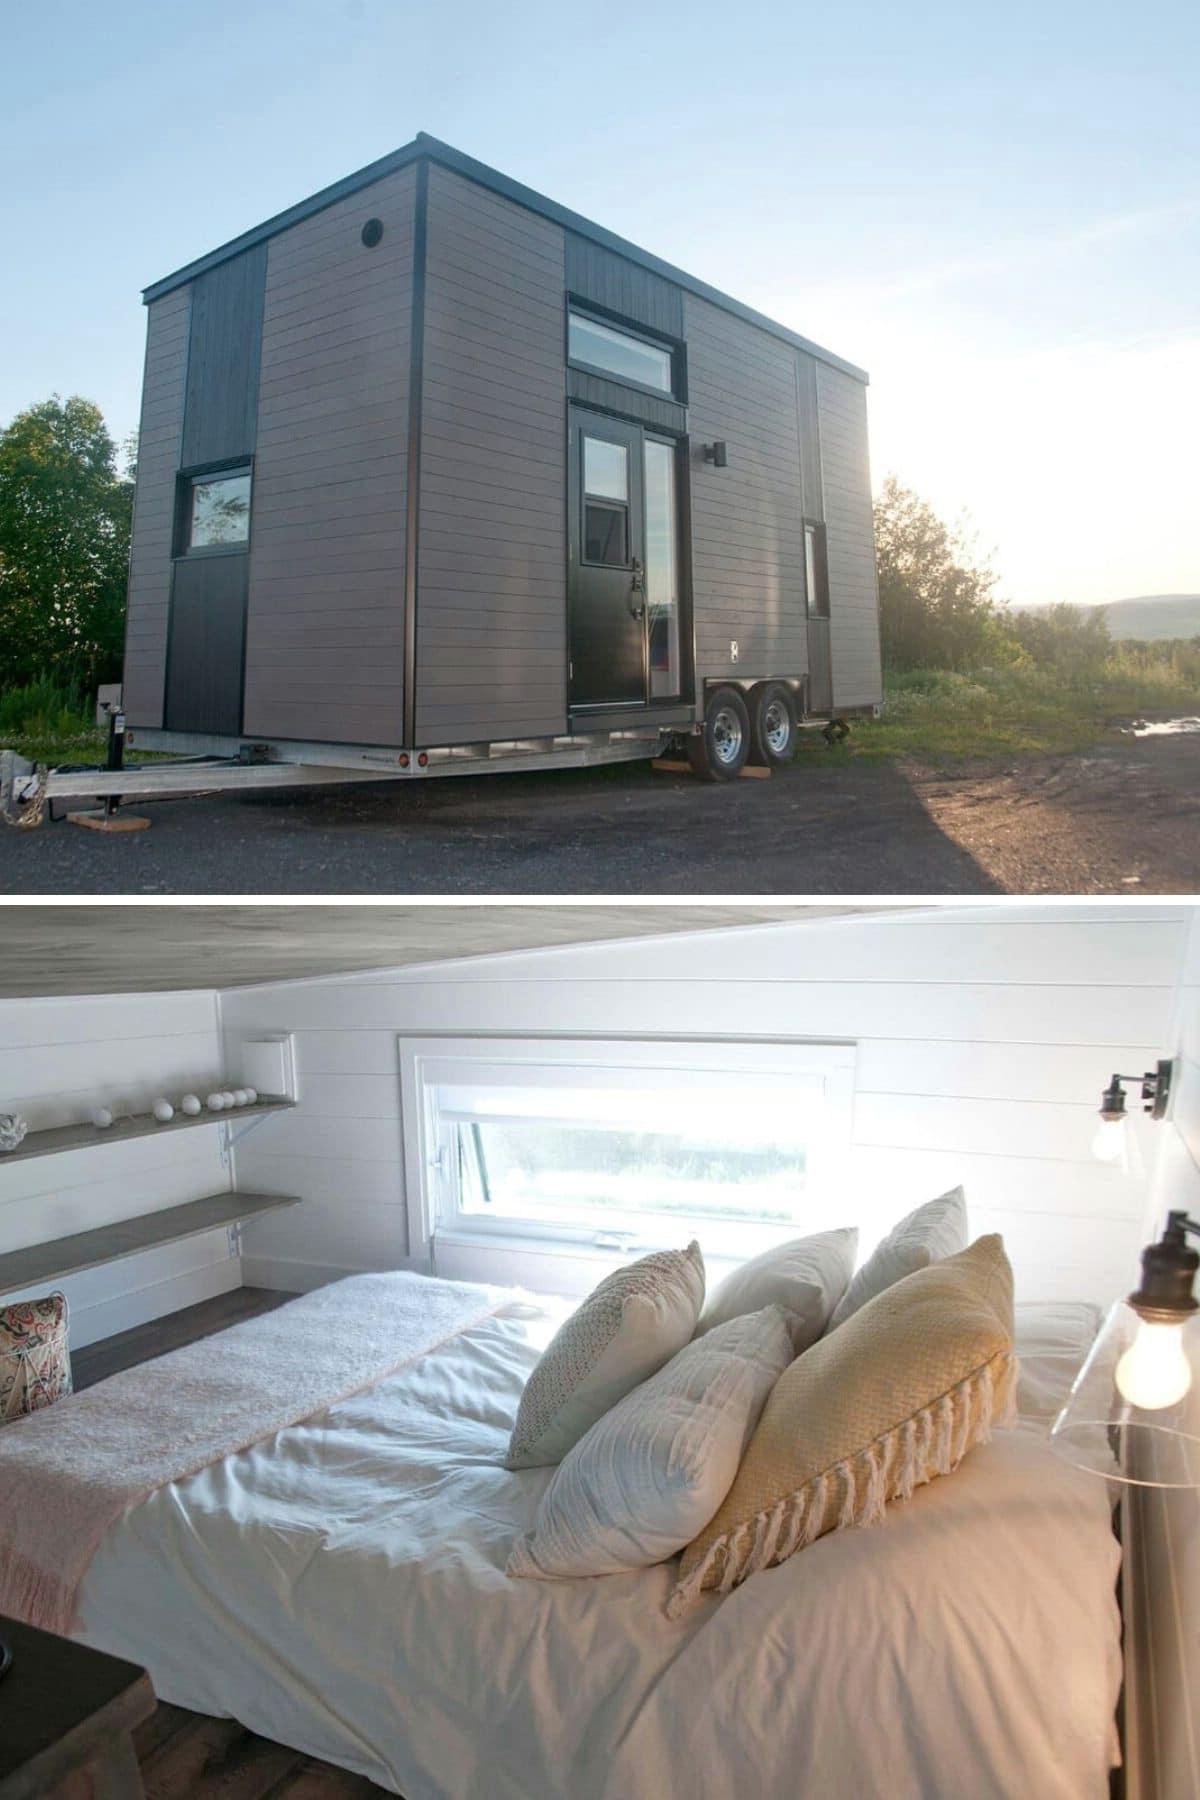 Cozy Little Loft With Built-In Shelves